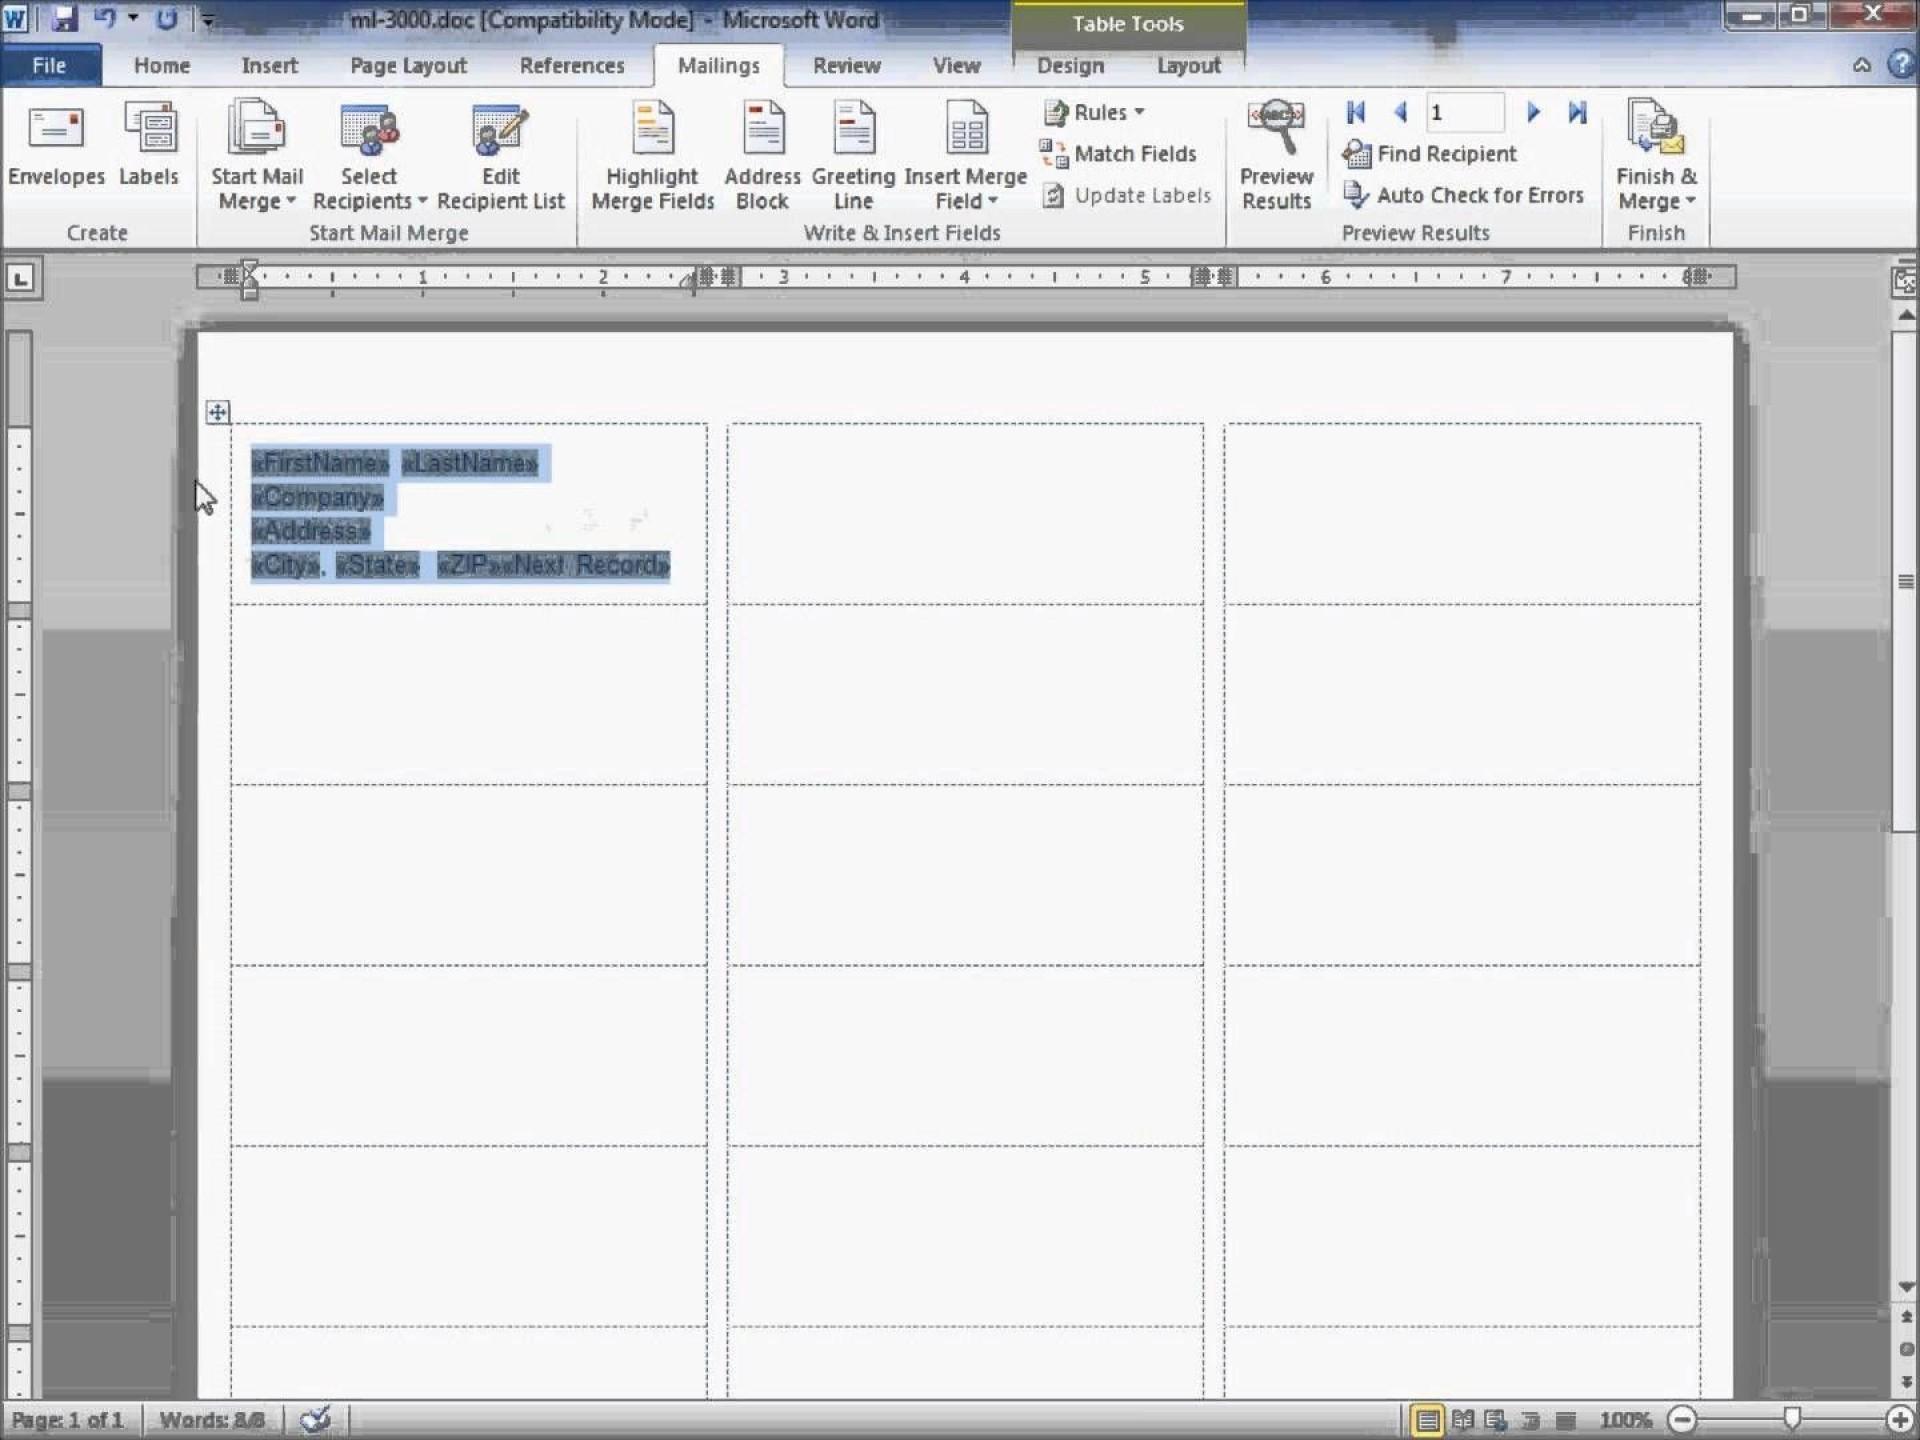 000 Impressive Microsoft Word Addres Label Template Concept  30 Per Sheet 14 161920